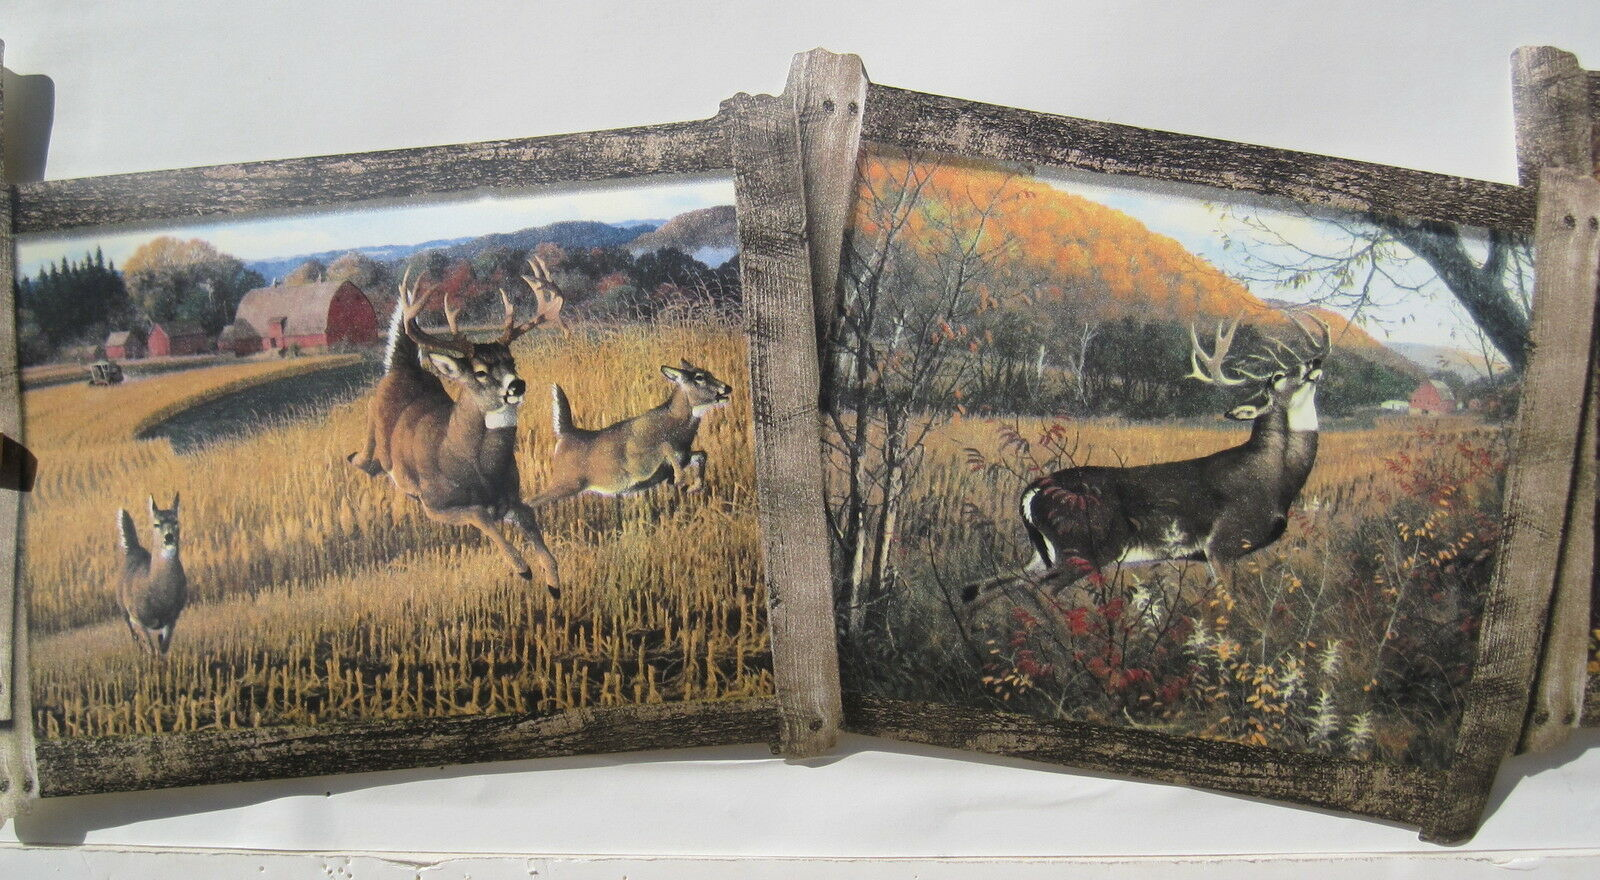 deer doe and buck hunting wallpaper border 8 1 2